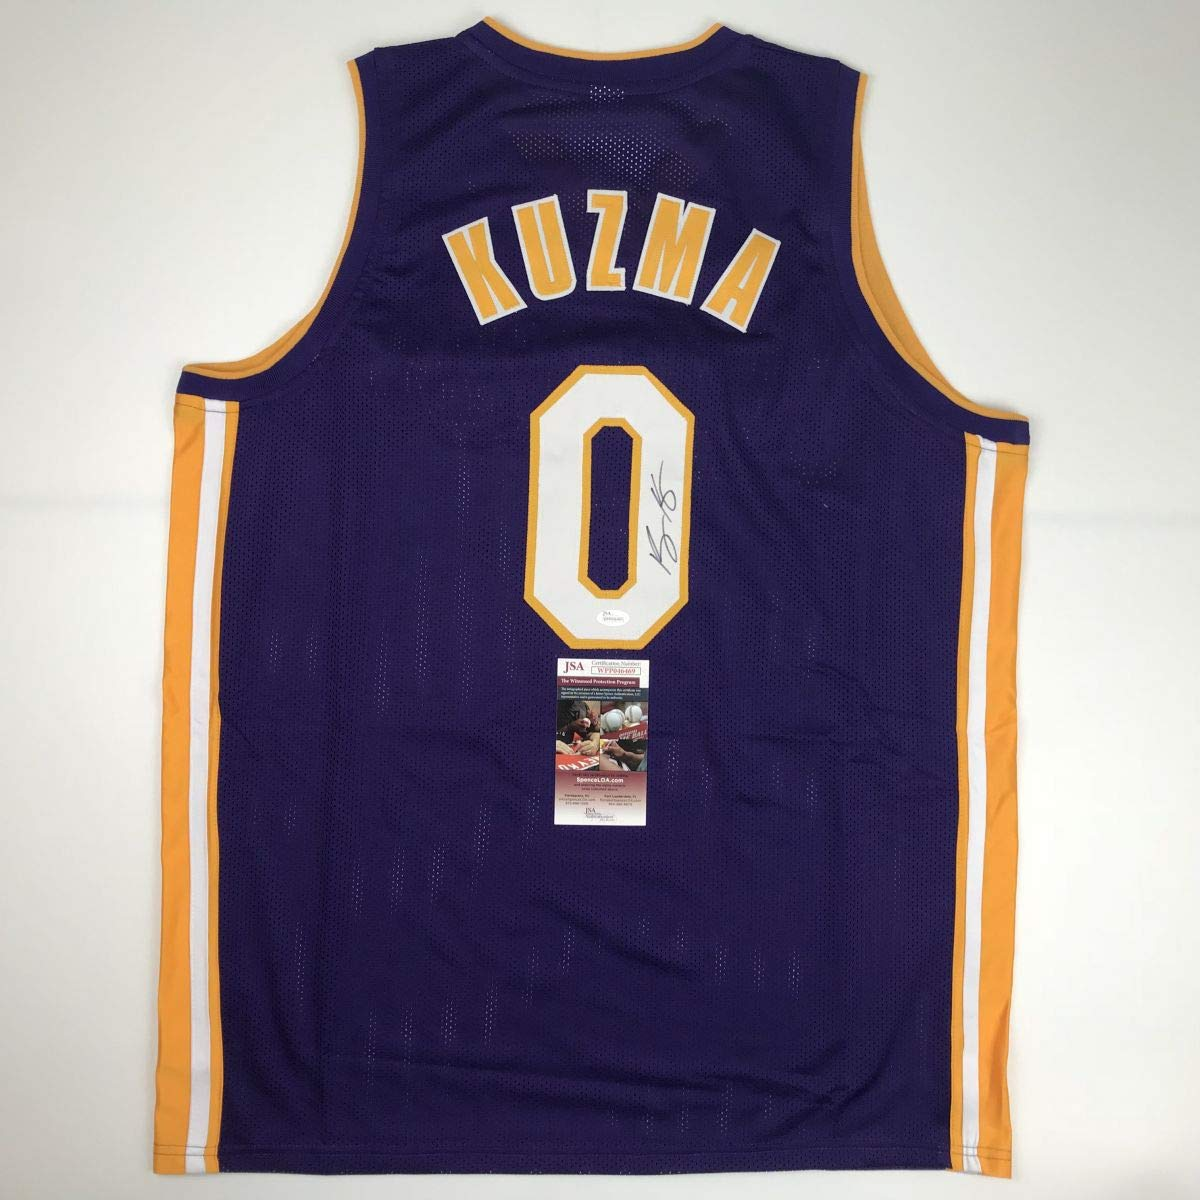 0b7402d0dd1 Autographed Signed Kyle Kuzma Los Angeles LA Purple Basketball Jersey JSA  COA at Amazon s Sports Collectibles Store